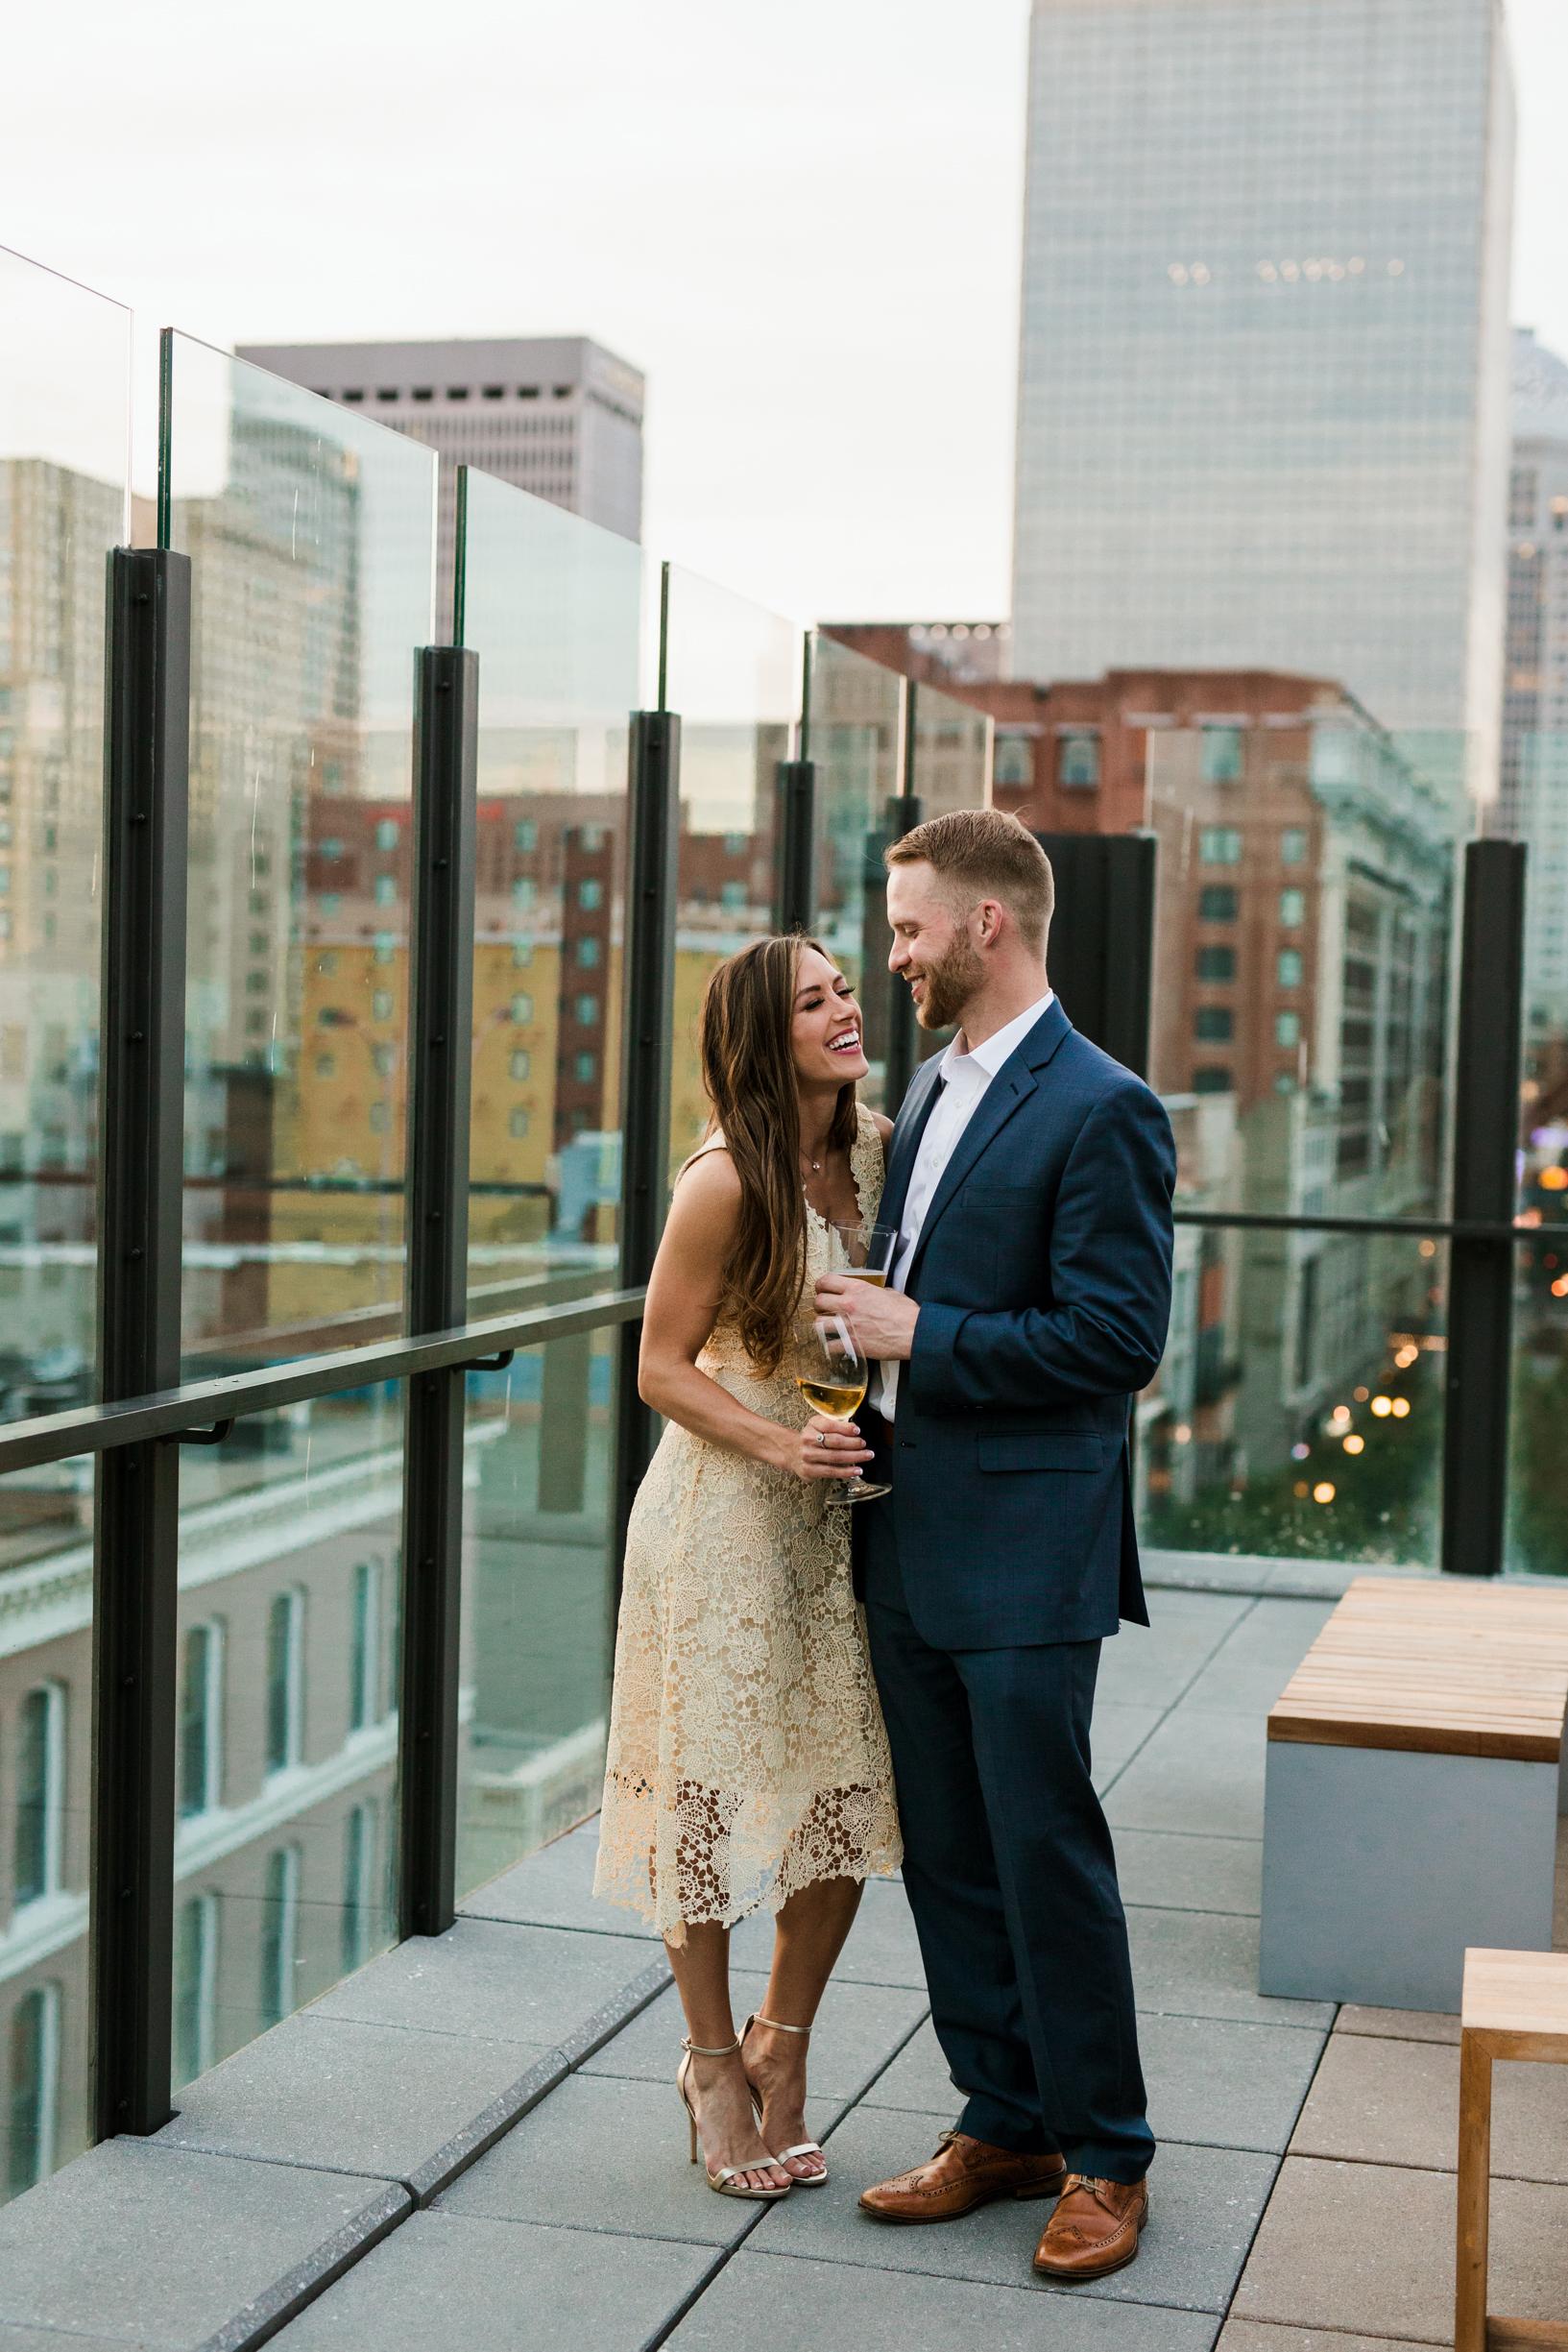 Victoria & Chad Engagement 2018 Crystal Ludwick Photo Louisville Kentucky Wedding Photographer WEBSITE (20 of 48).jpg